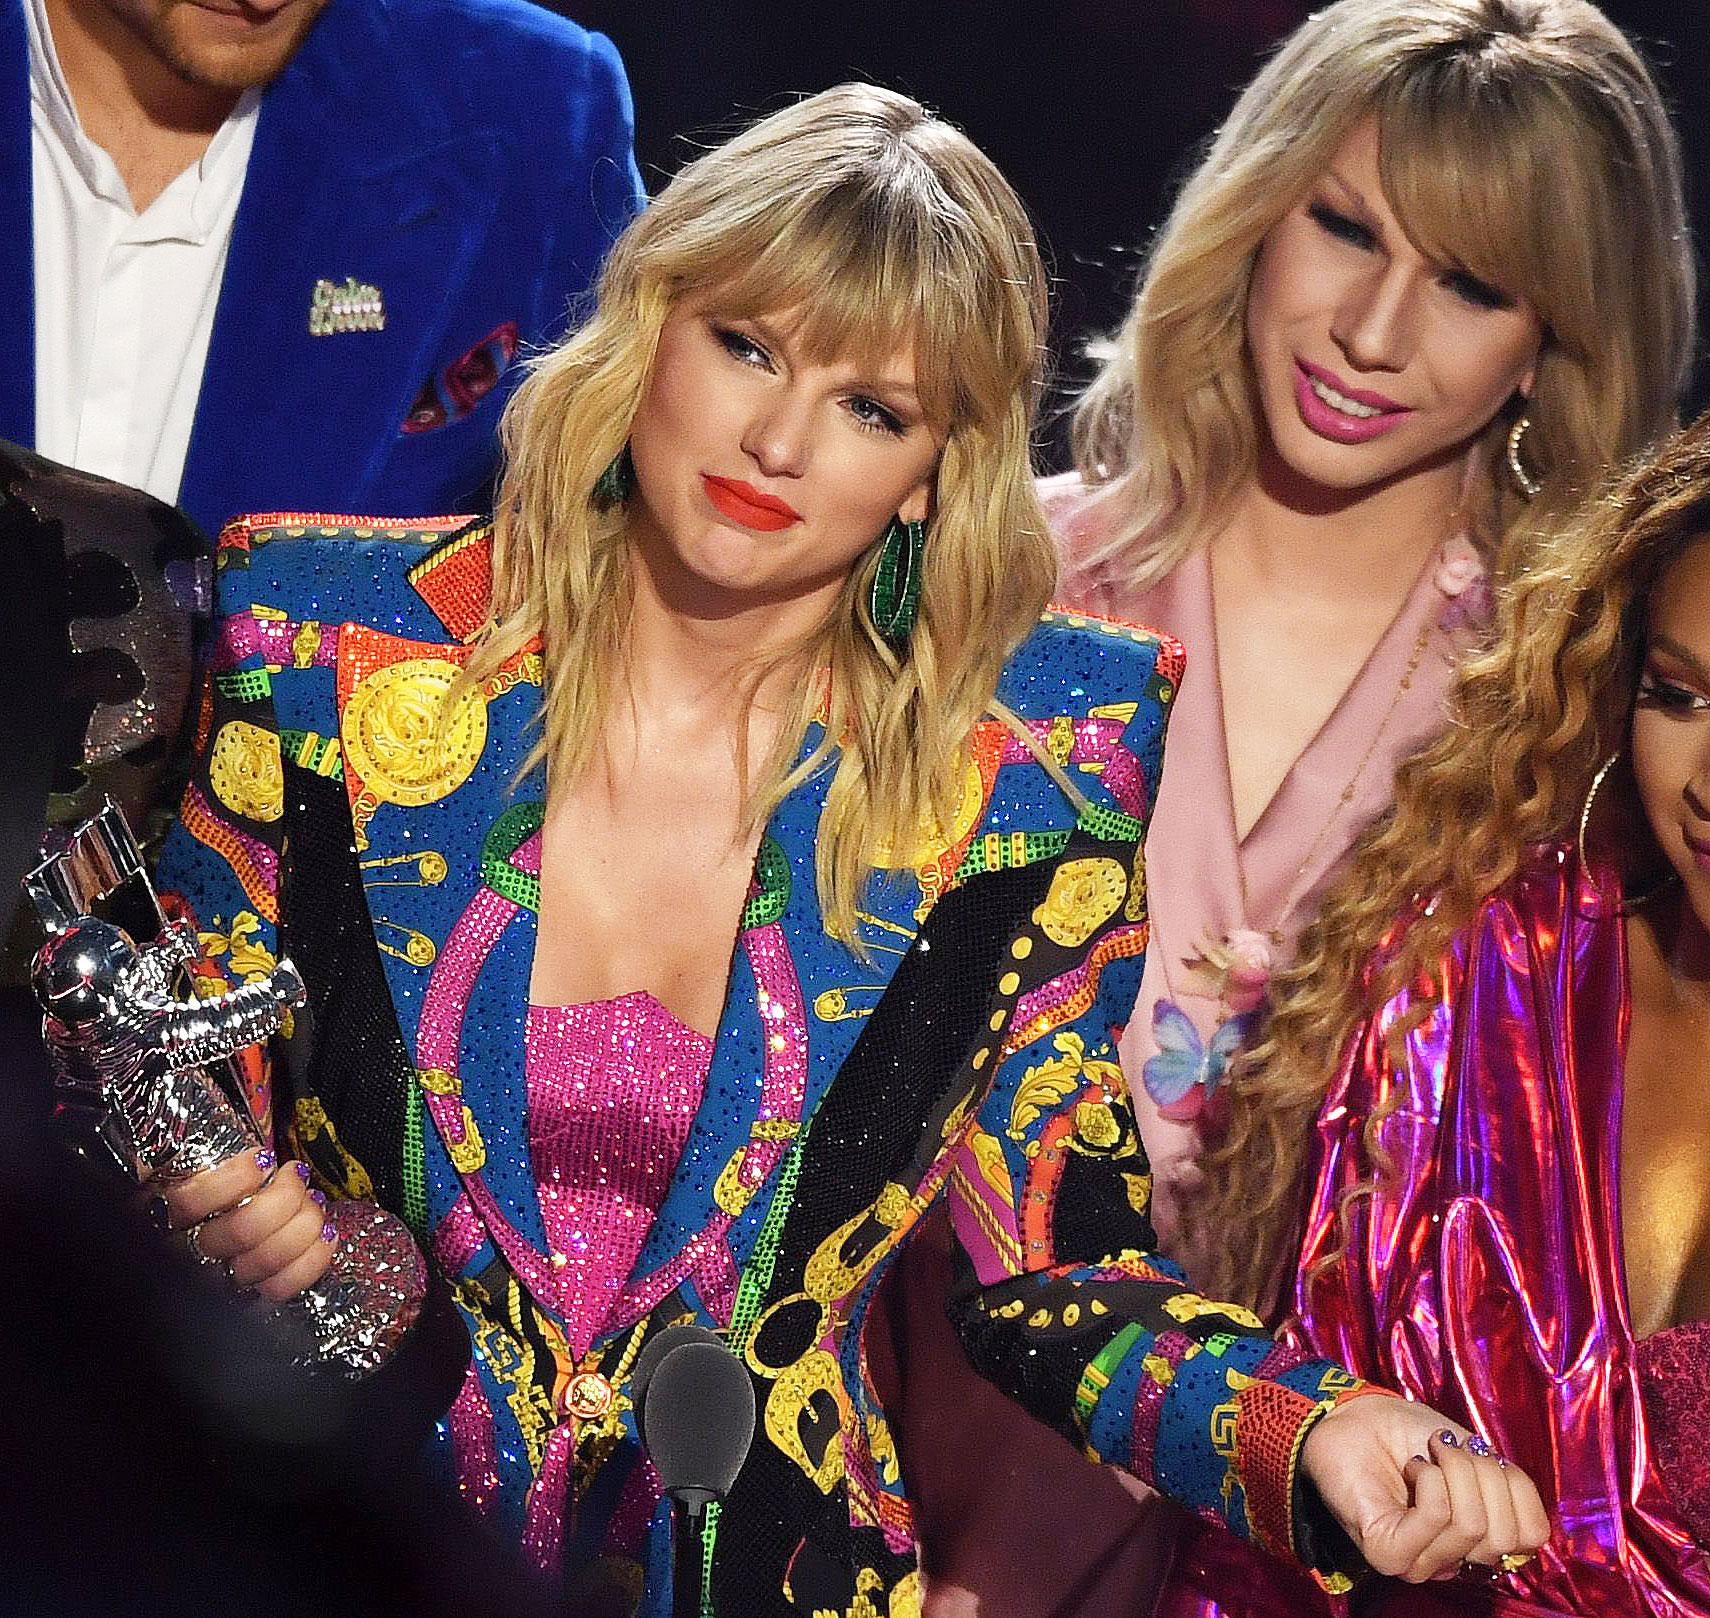 John Travolta Mistakes RuPaul's Jade Jolie for Taylor Swift at VMAs